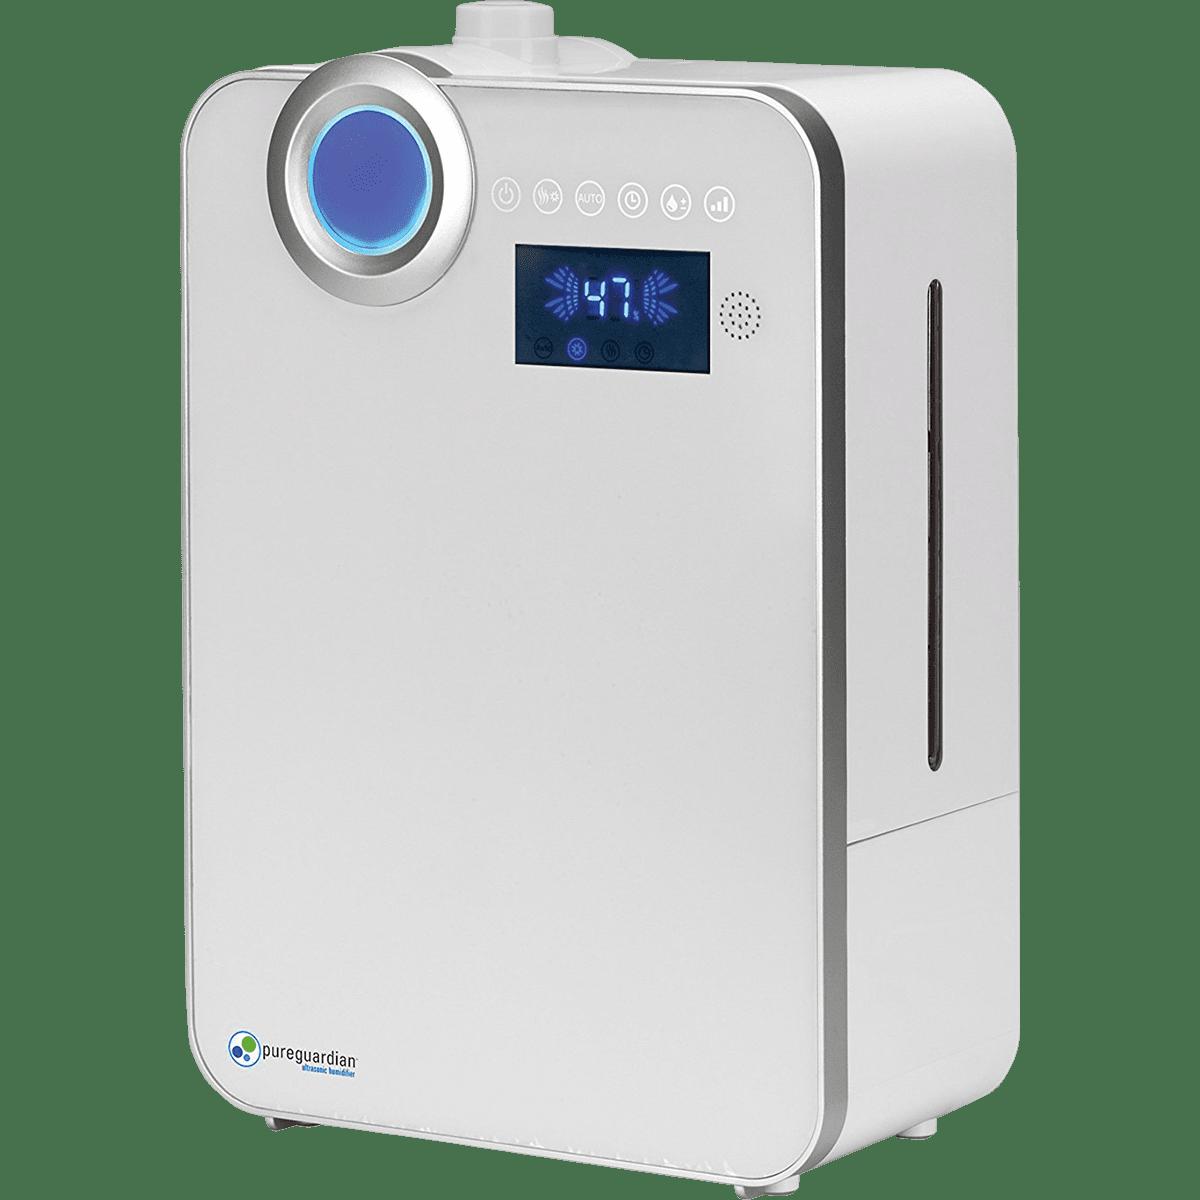 PureGuardian 90-Hour Smart Mist Ultrasonic Humidifier - H7550 ge3557